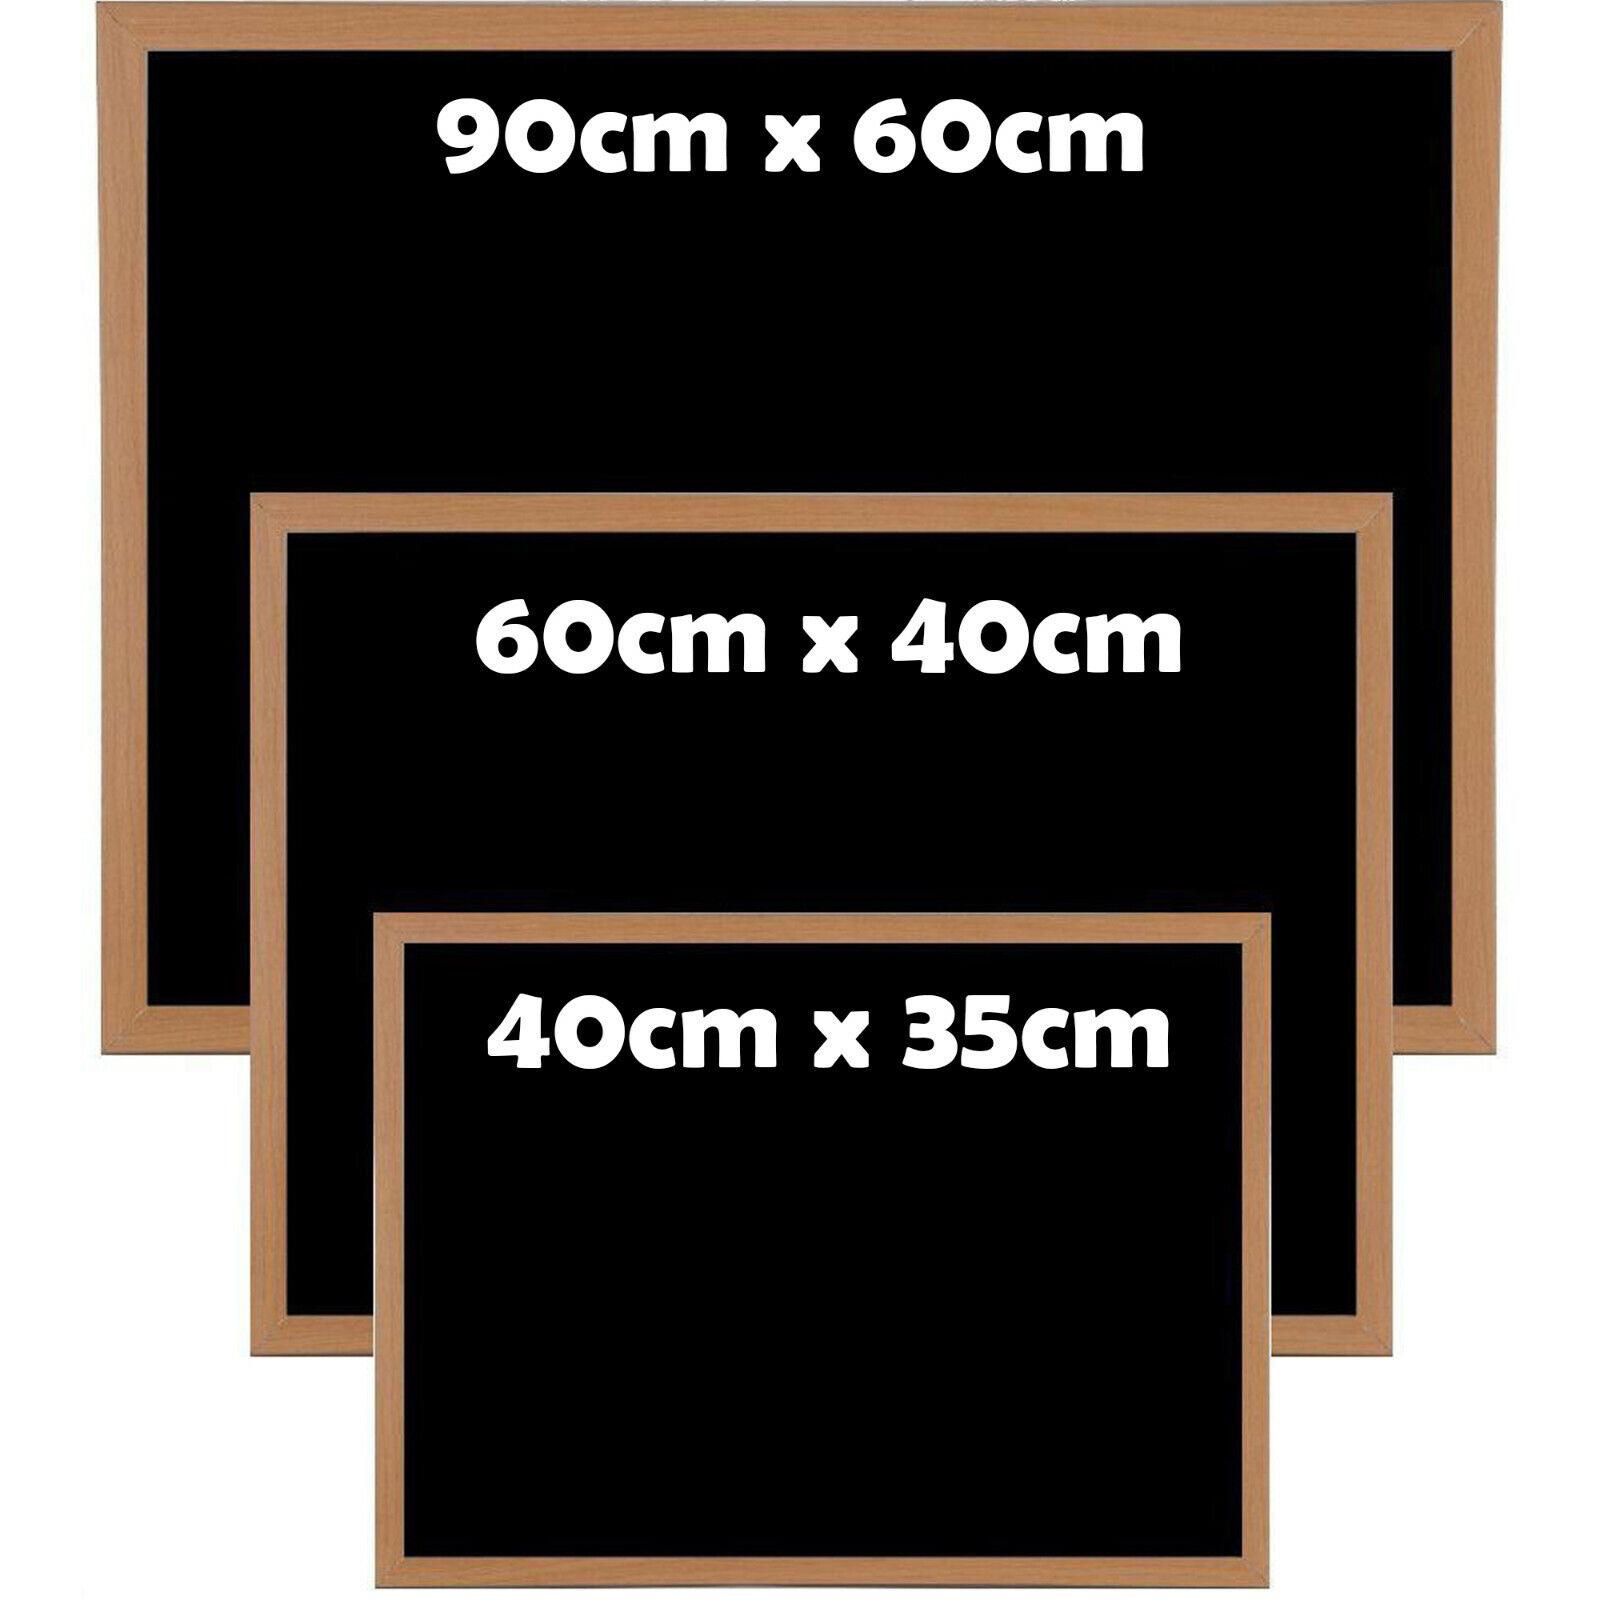 Blackboard Chalk Large 90x60 Wall Mounted Magnetic Memo Home Chalkboard For Kids For Sale Ebay